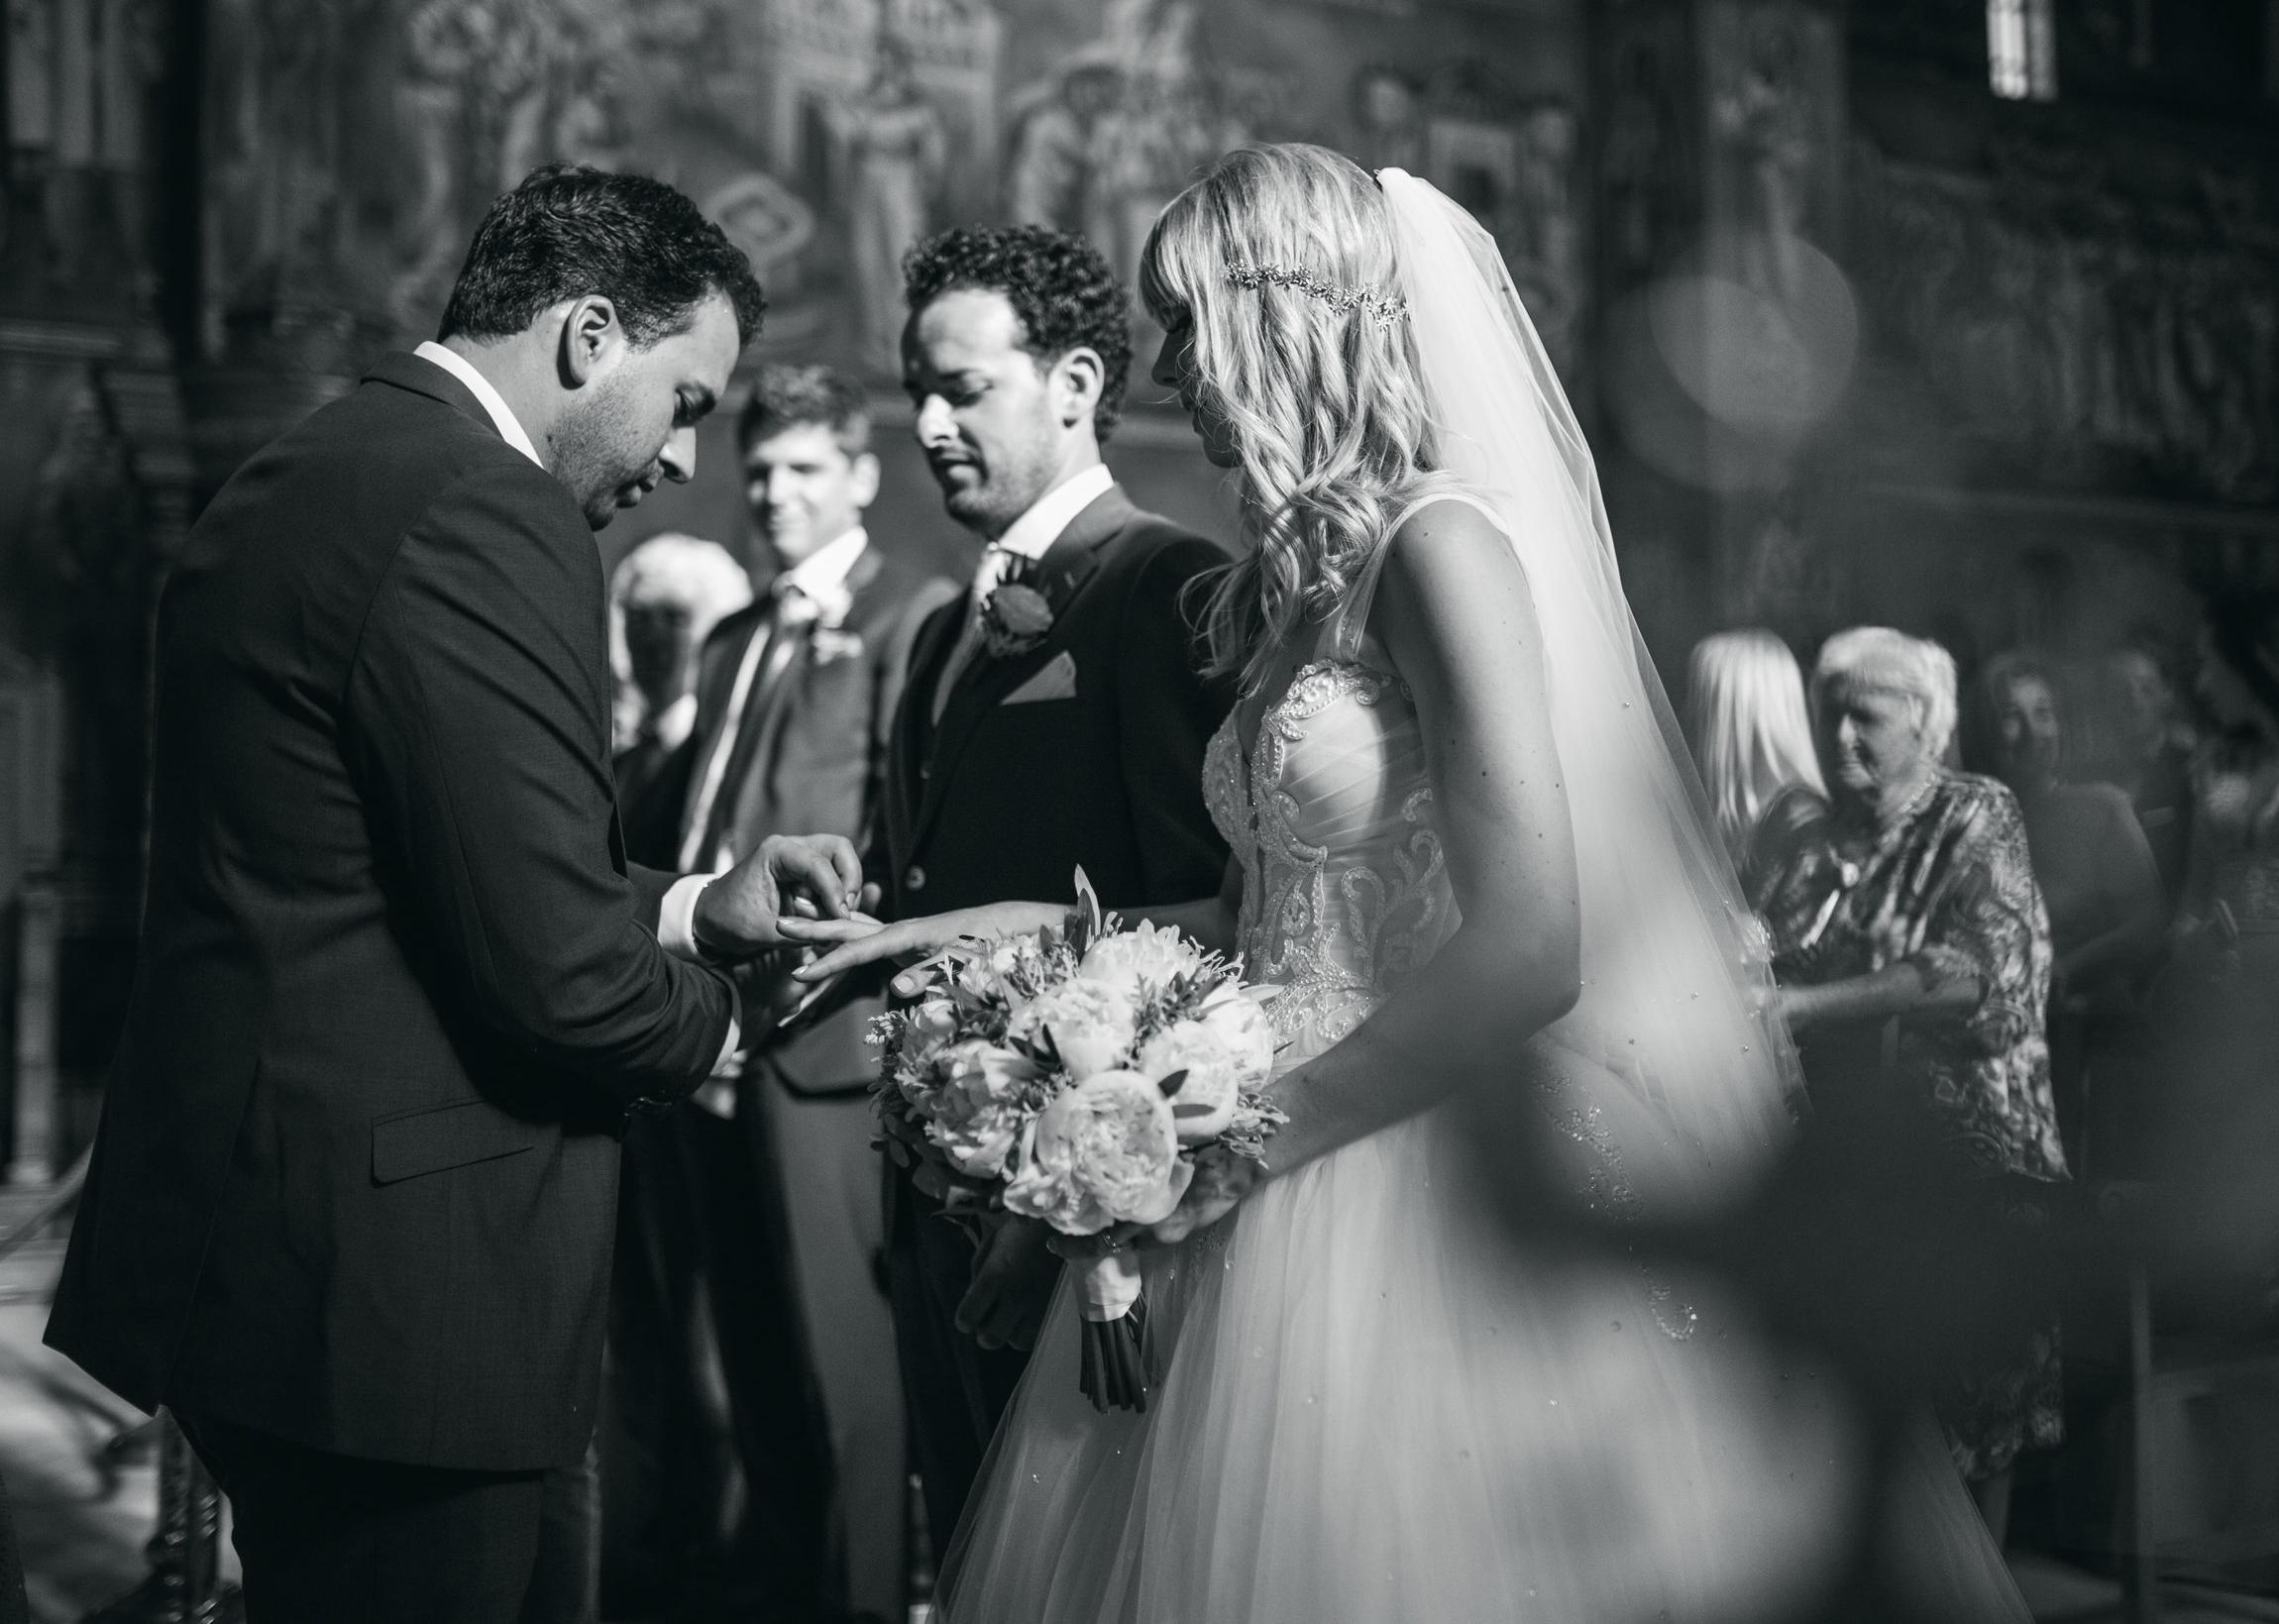 Wedtime_Stories_-_Nikolaos__Stefanie_-_Ceremony-92.jpg